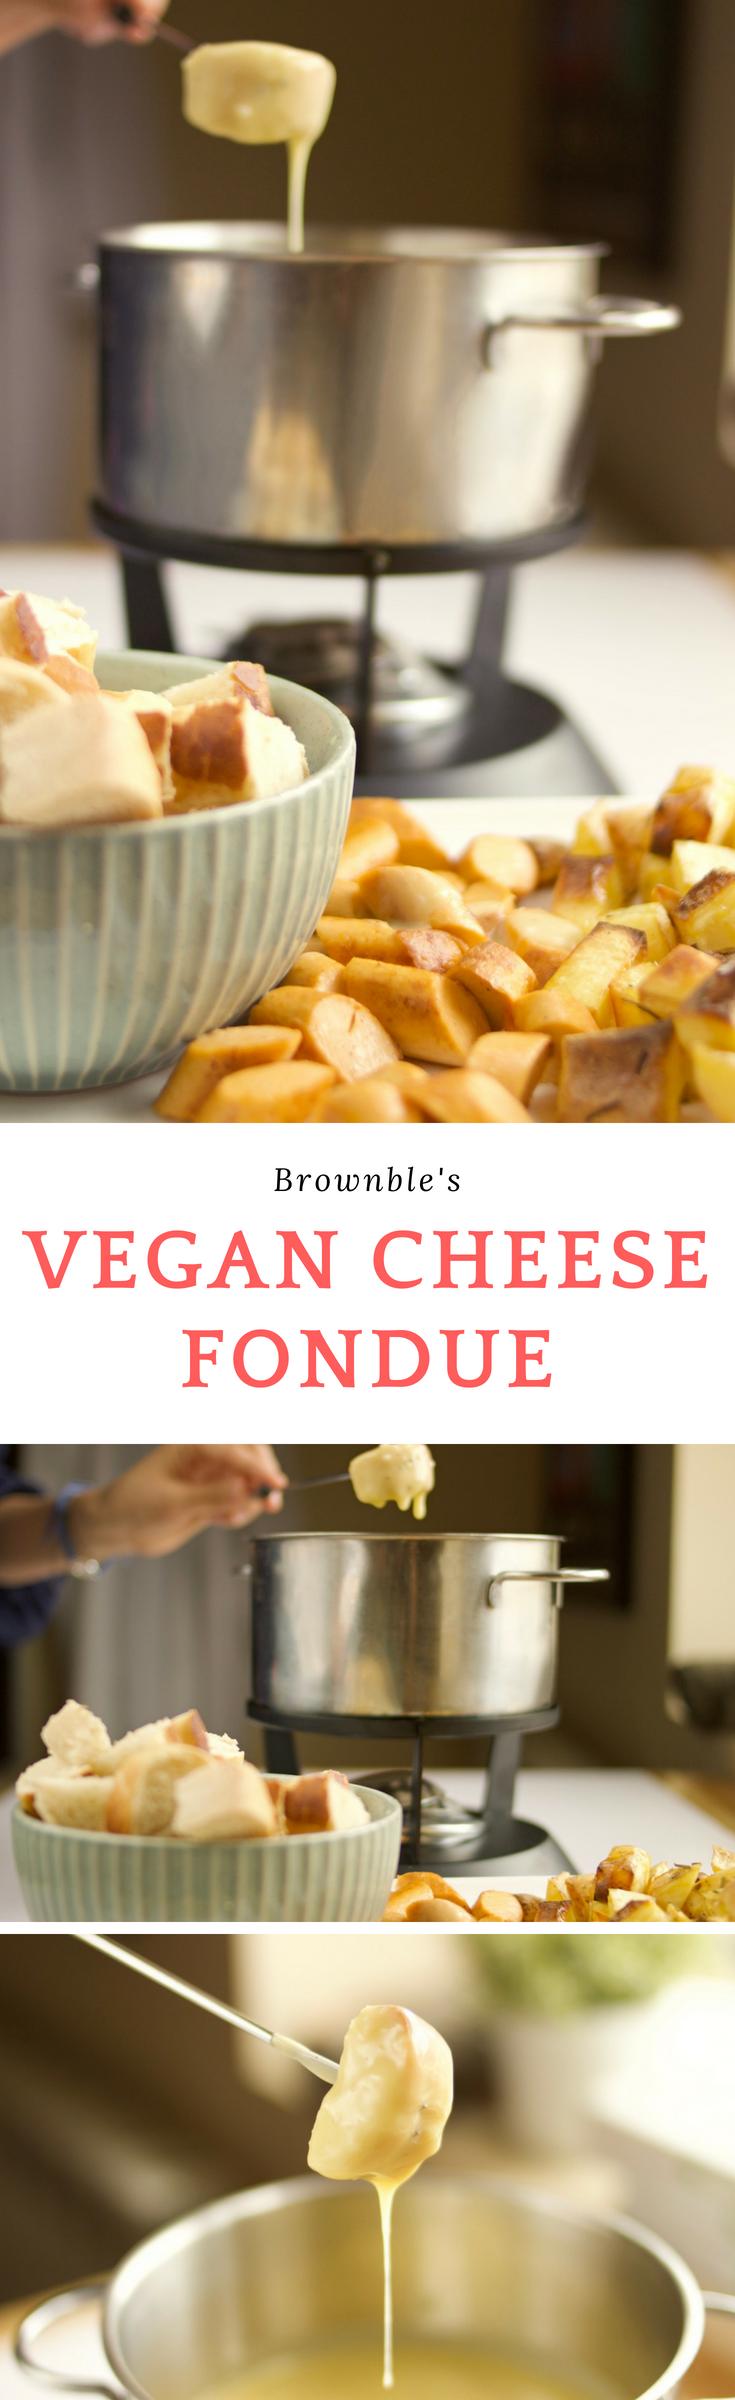 The Cheesiest Vegan Cheese Fondue Recipe by Brownble